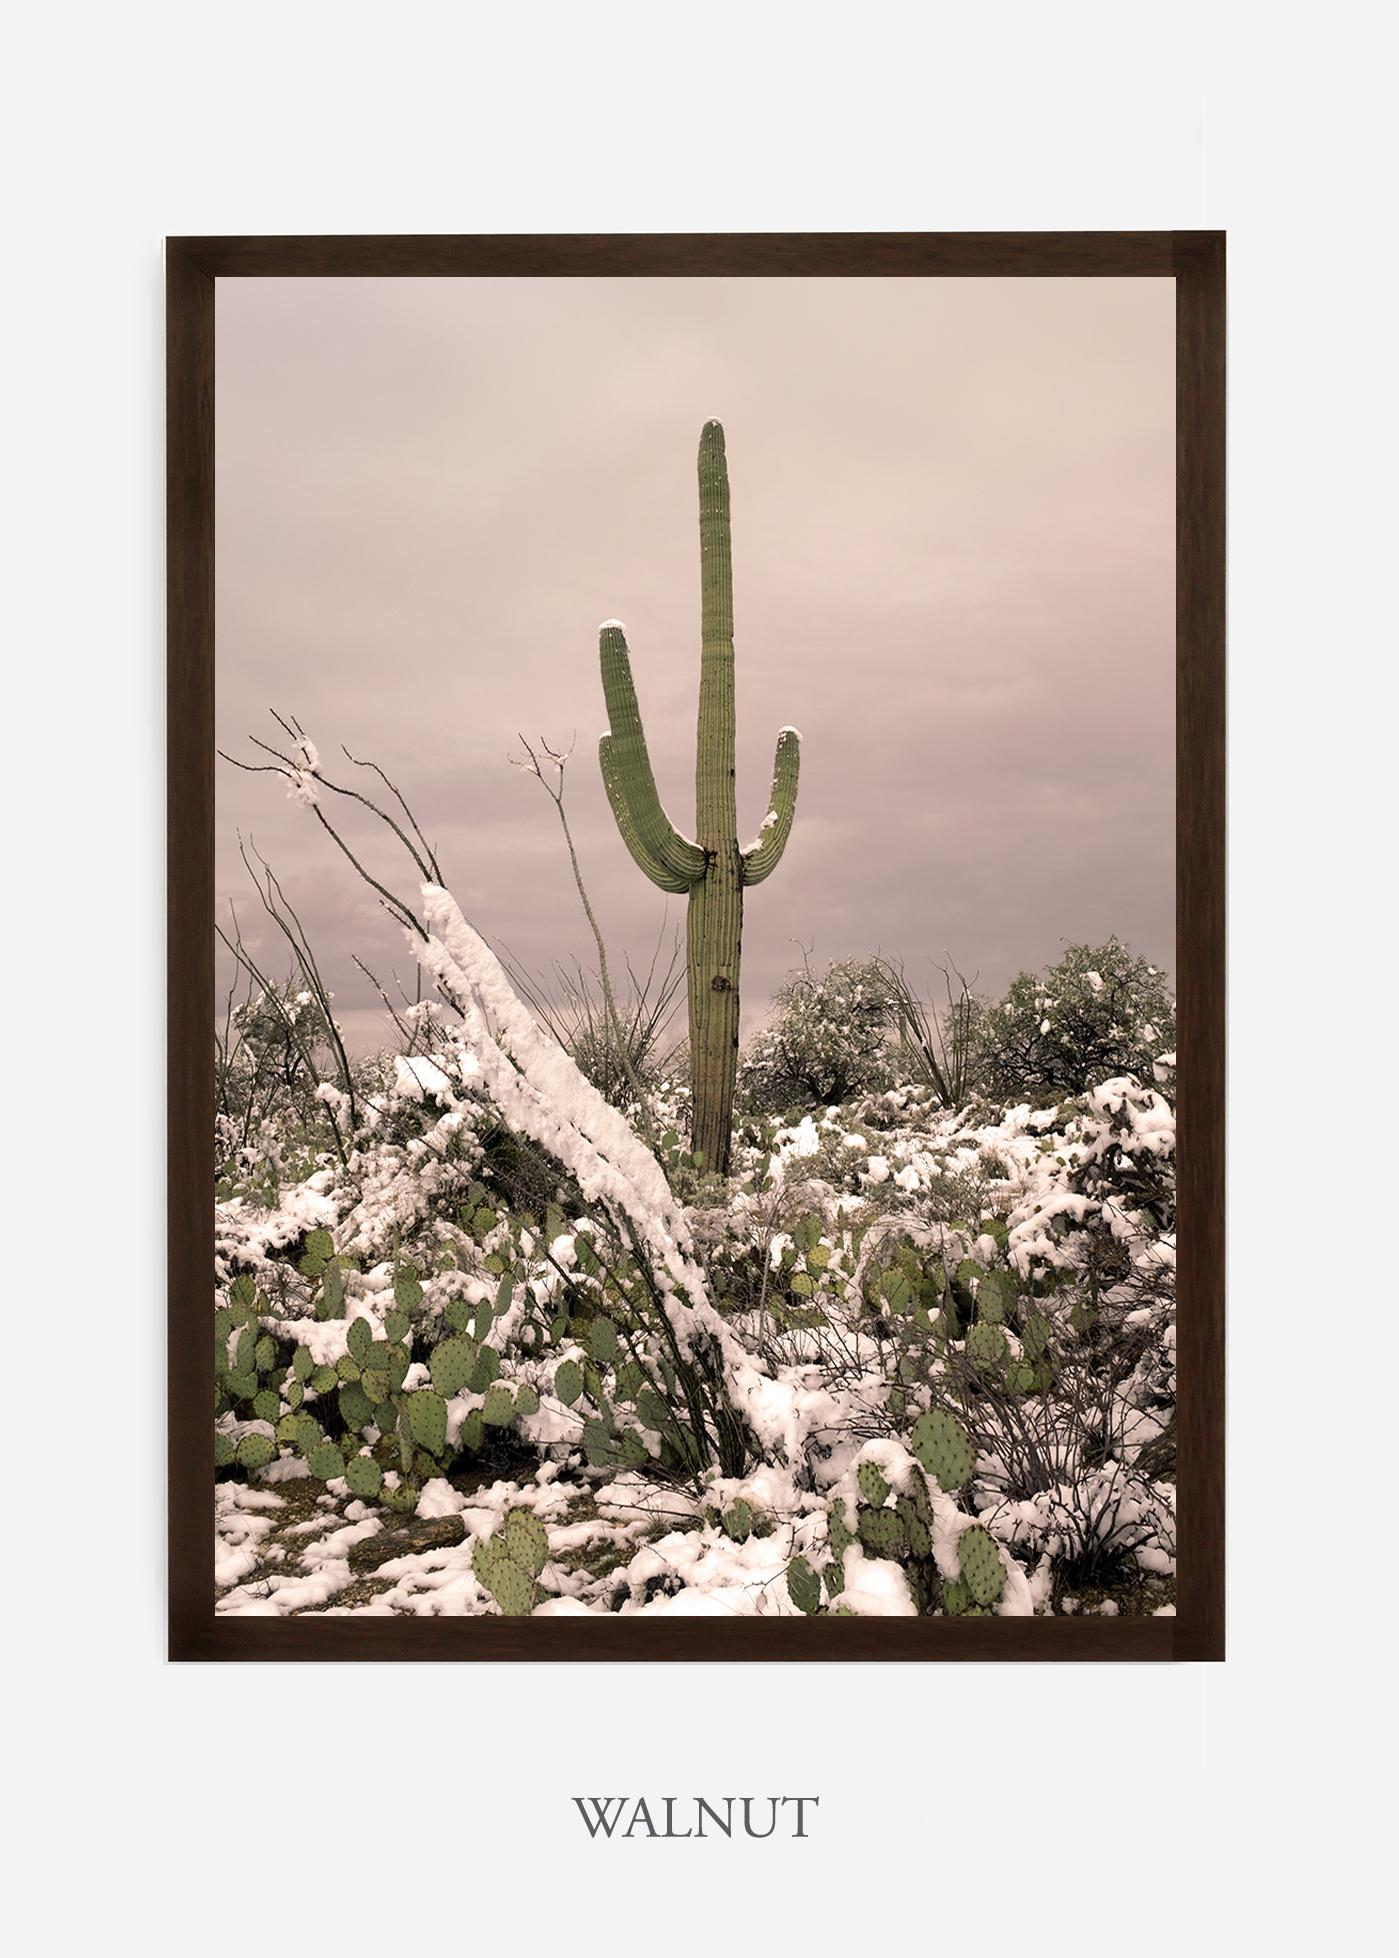 nomat-walnutframe-saguaroNo.4-wildercalifornia-art-wallart-cactusprint-homedecor-prints-arizona-botanical-artwork-interiordesign.jpg